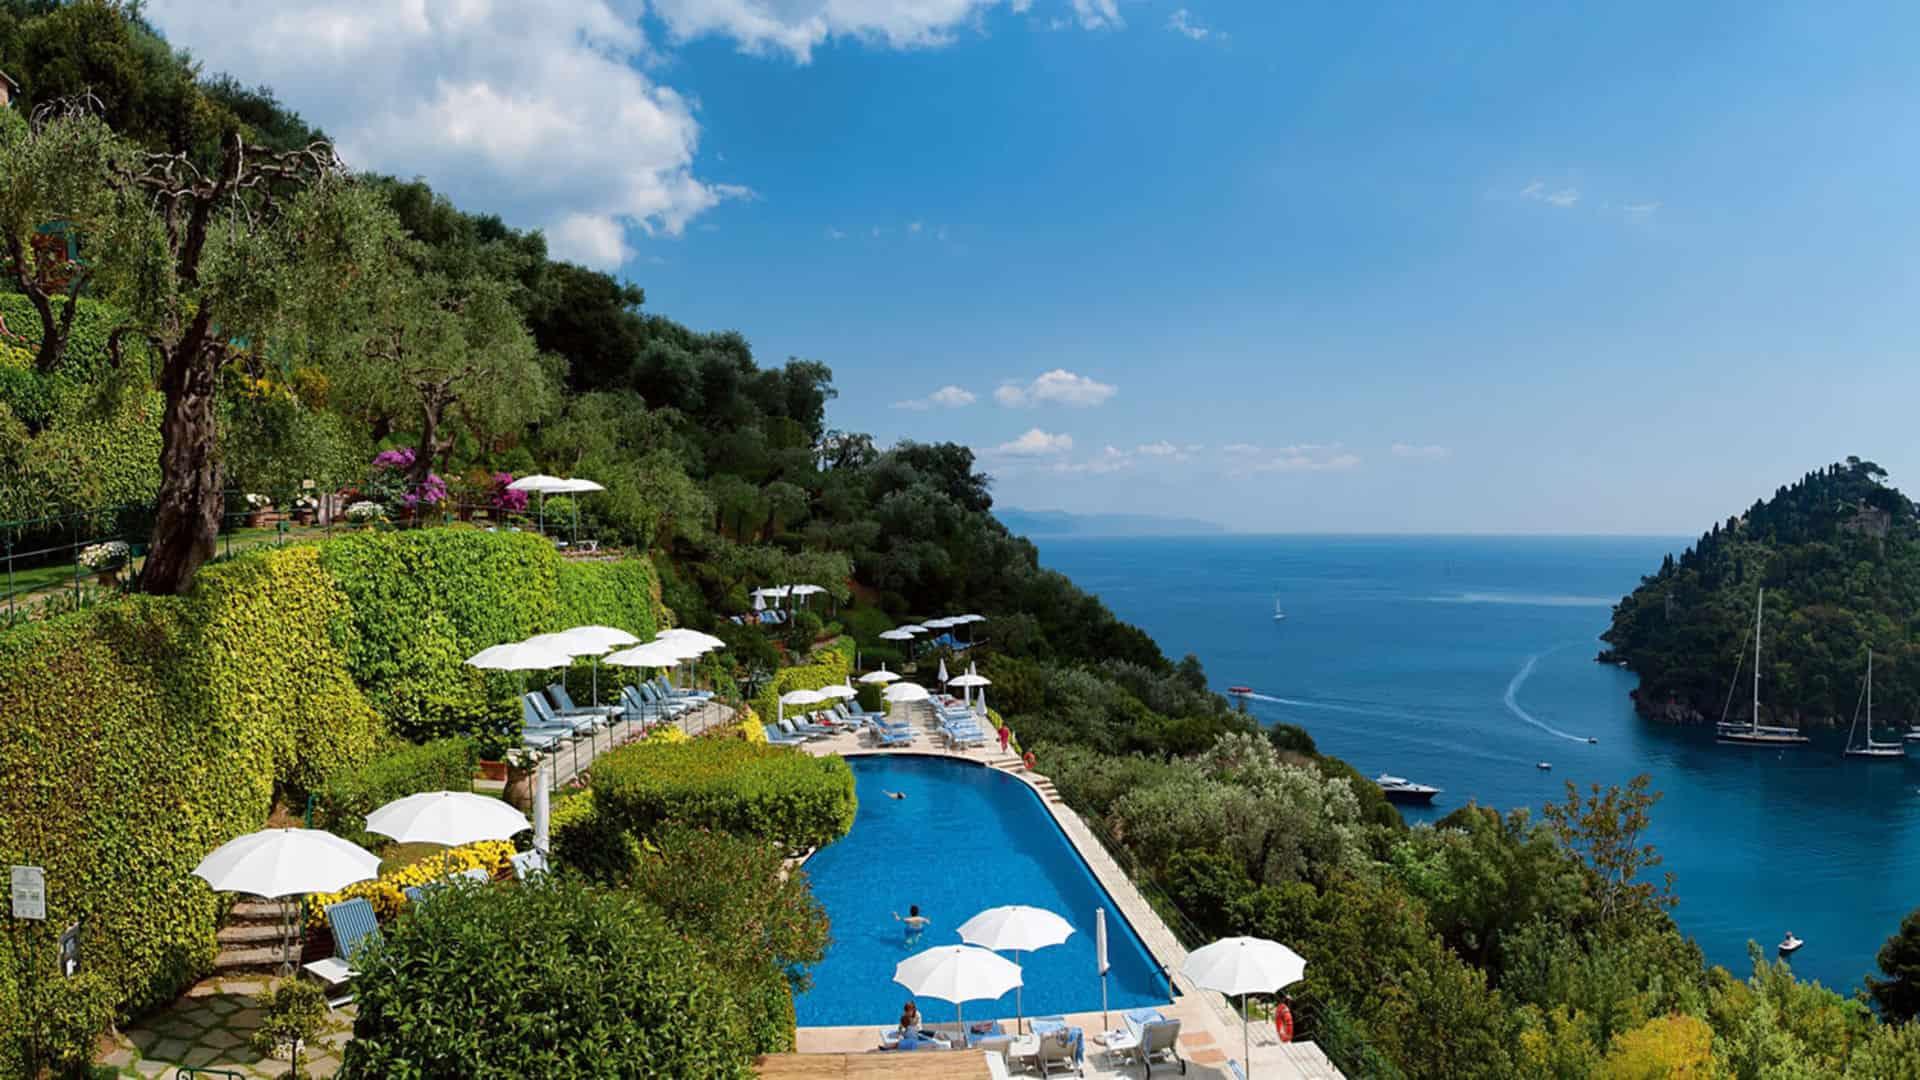 Belmond Hotel Splendido Gardens pool